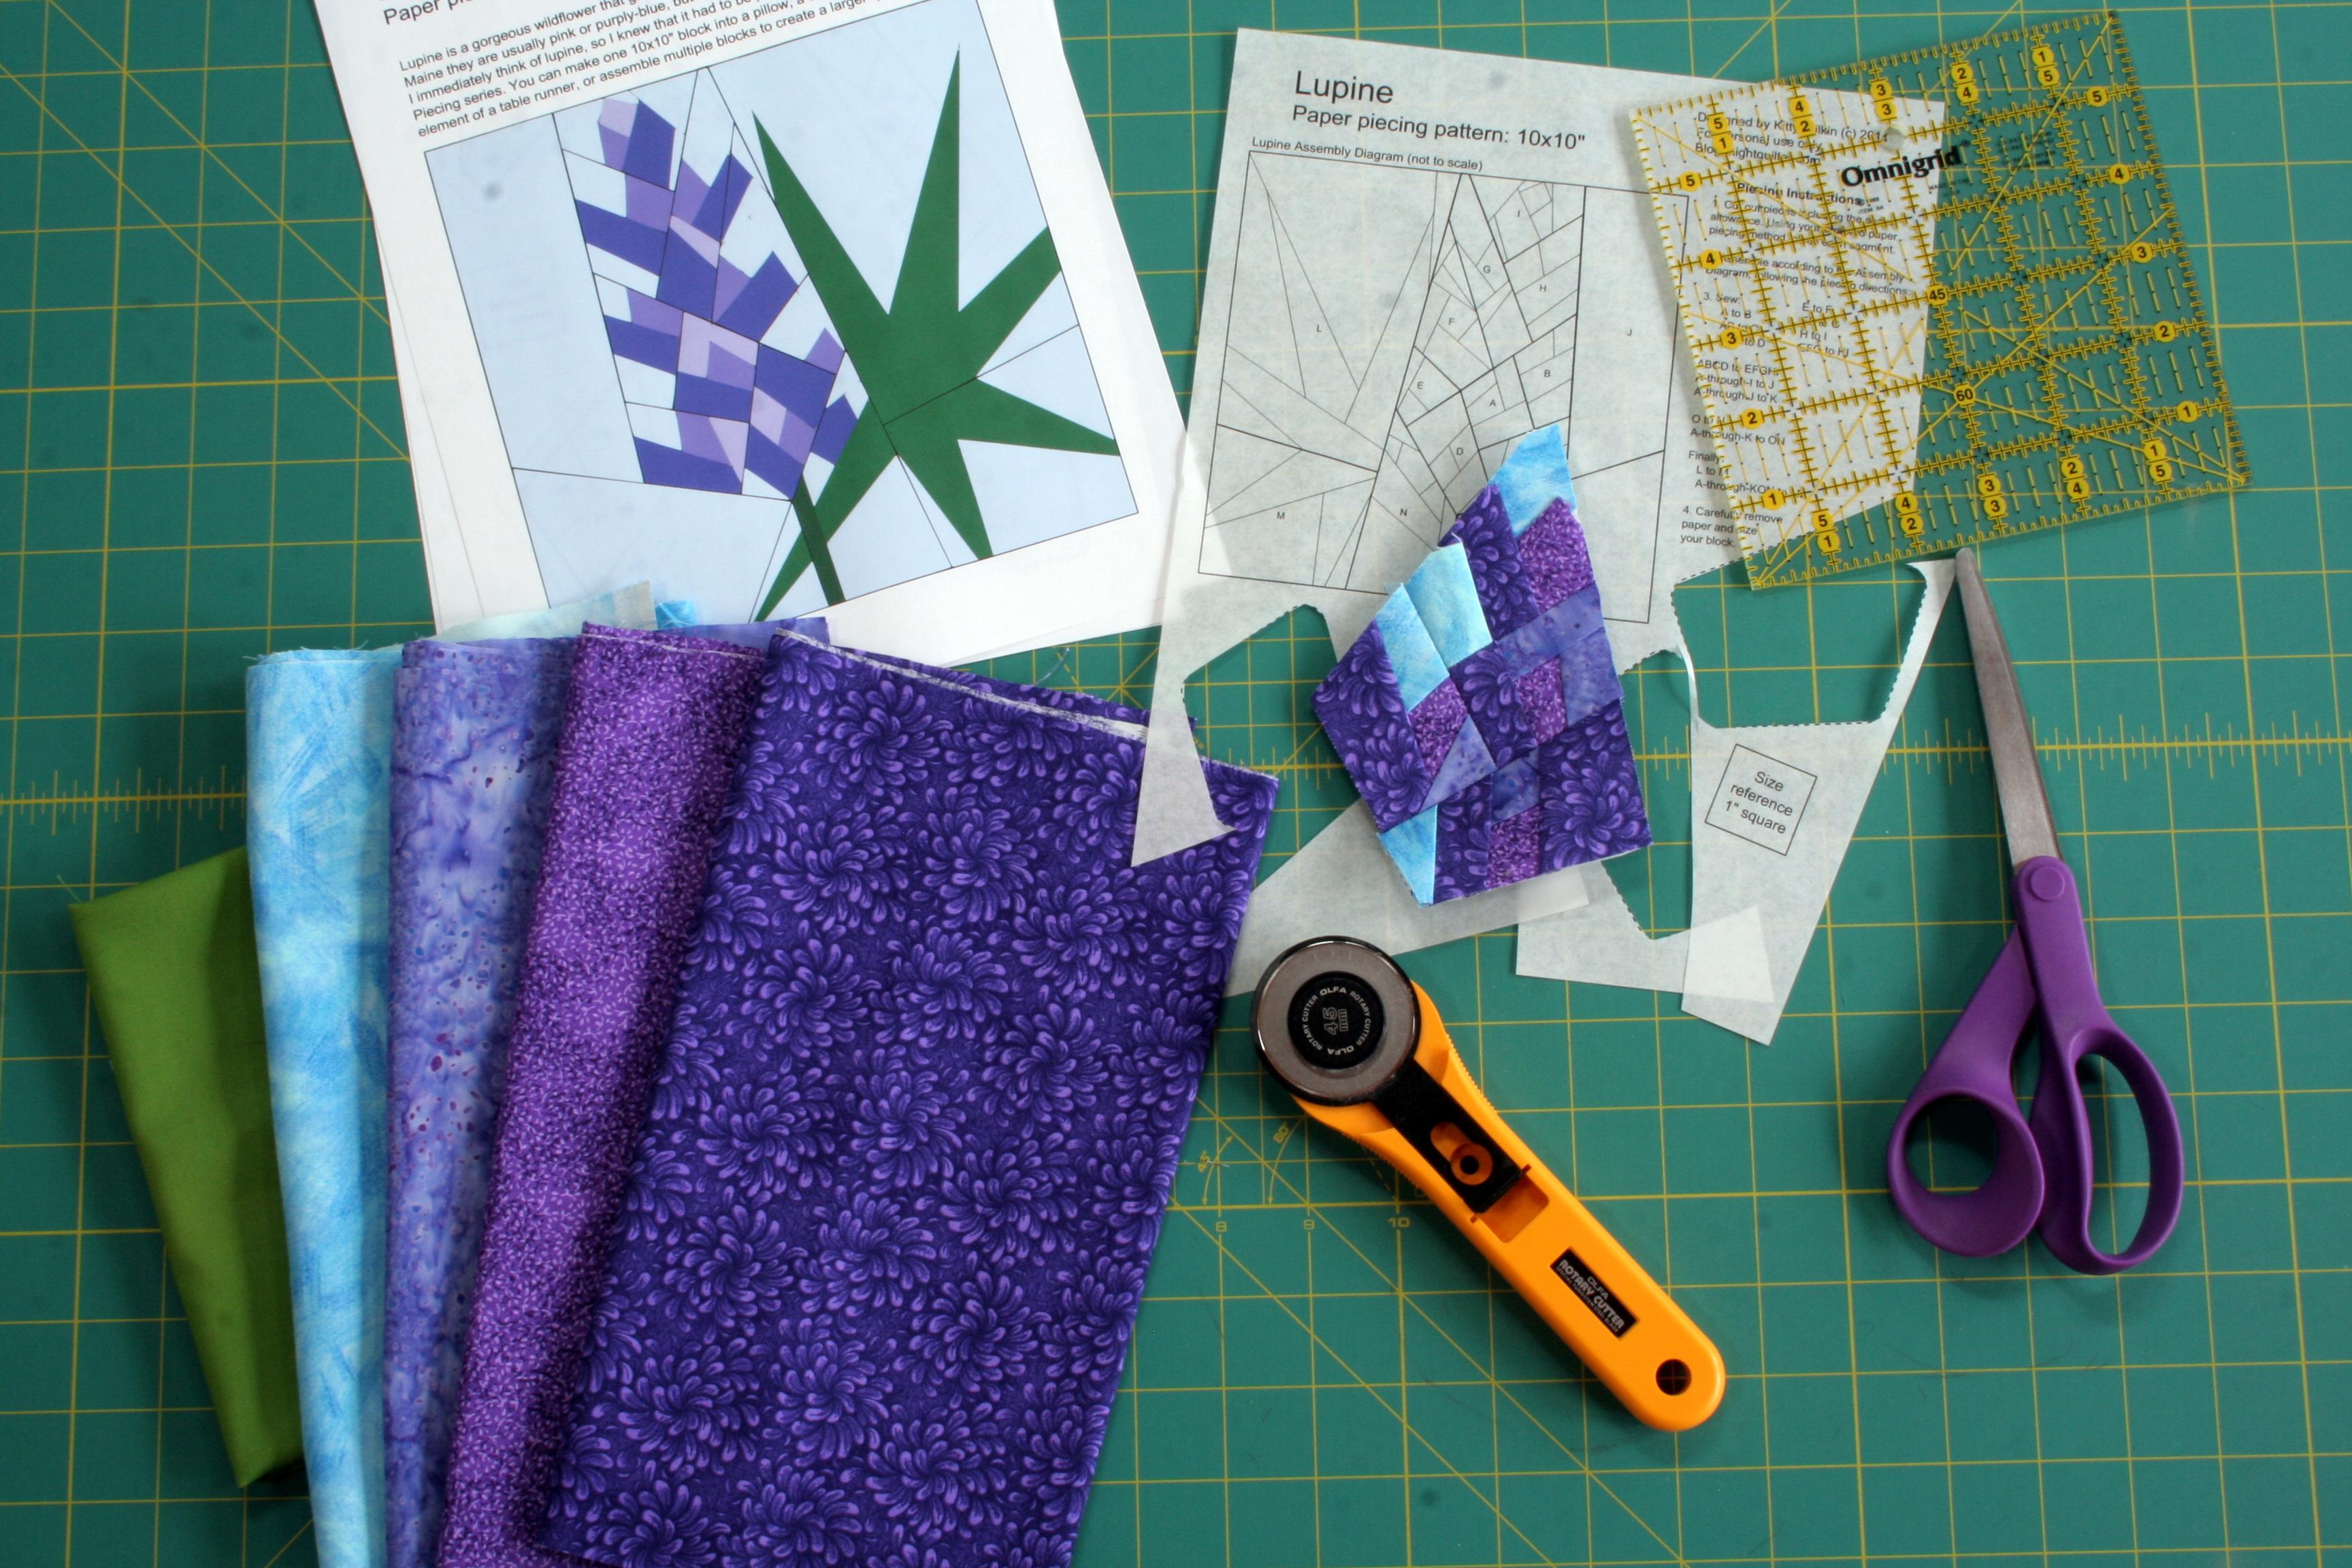 Work In Progress Lupine Paper Piecing Pattern Night Quilter